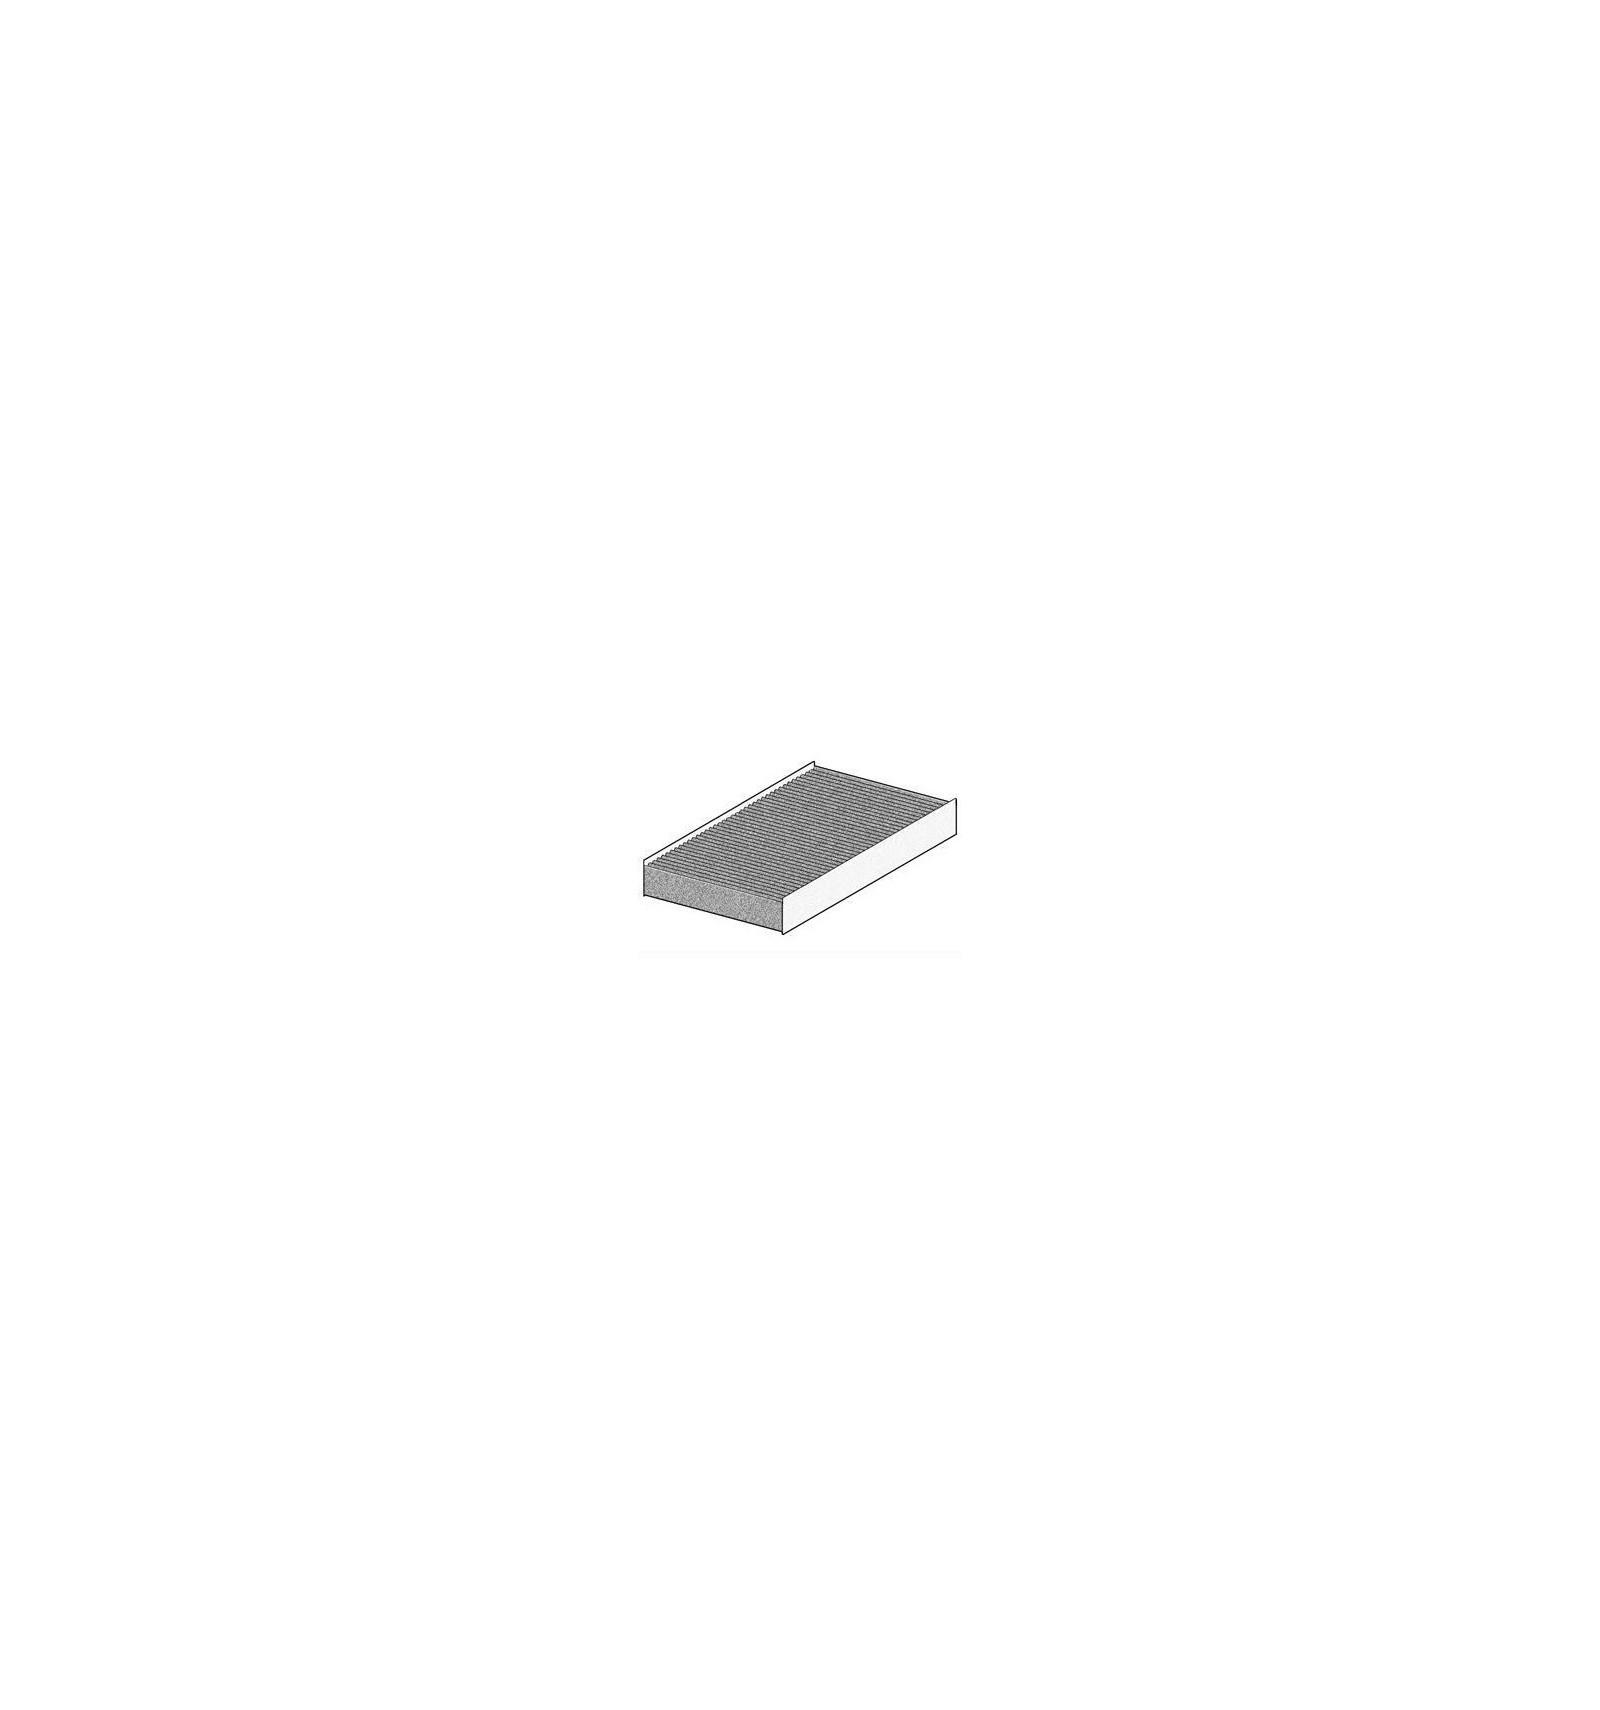 filtre habitacle citroen c5 c6 hdi peugeot 407 hdi. Black Bedroom Furniture Sets. Home Design Ideas